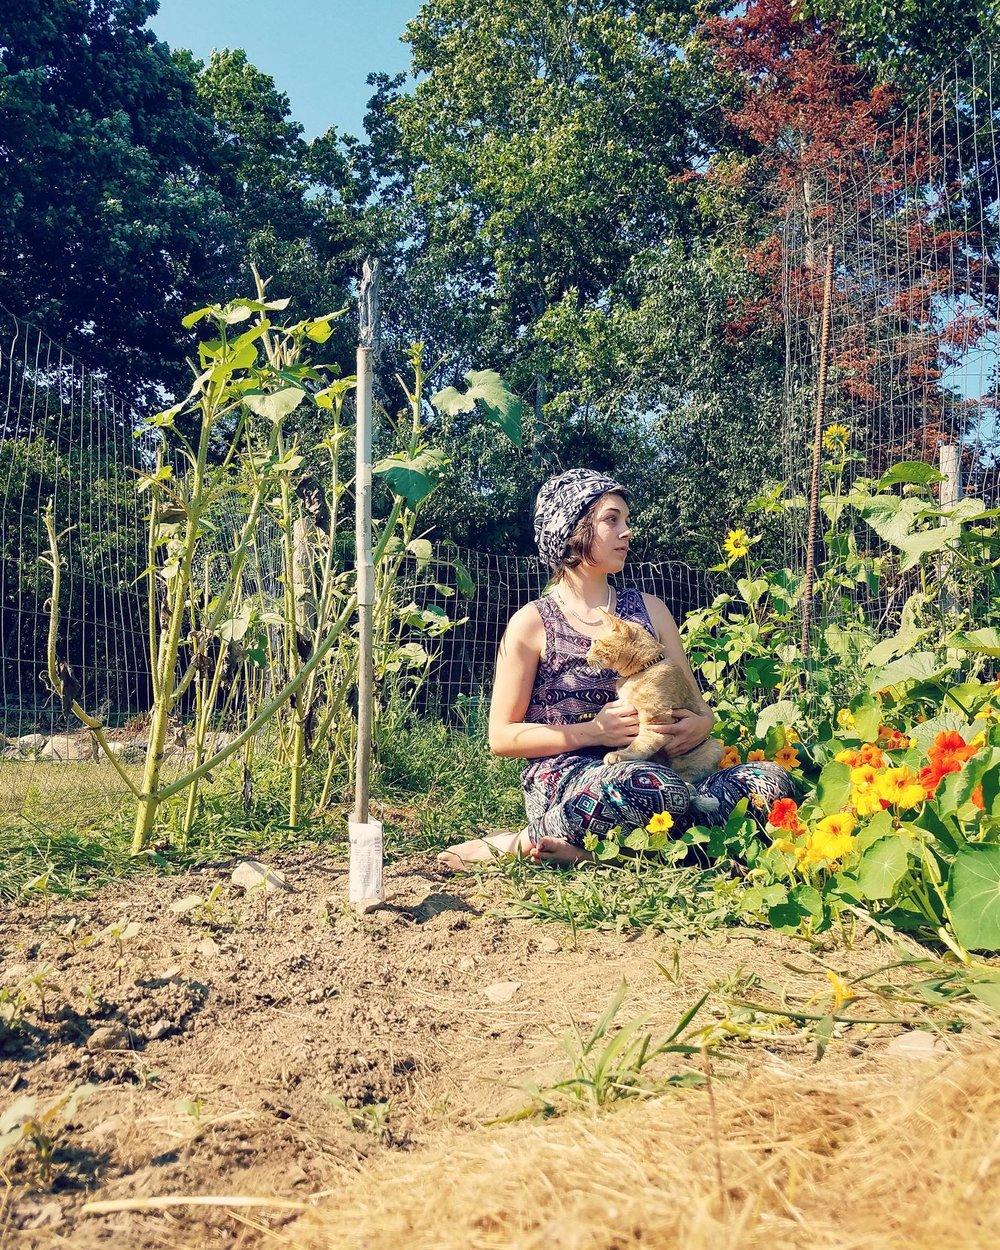 Marina in a garden with kitty .jpg